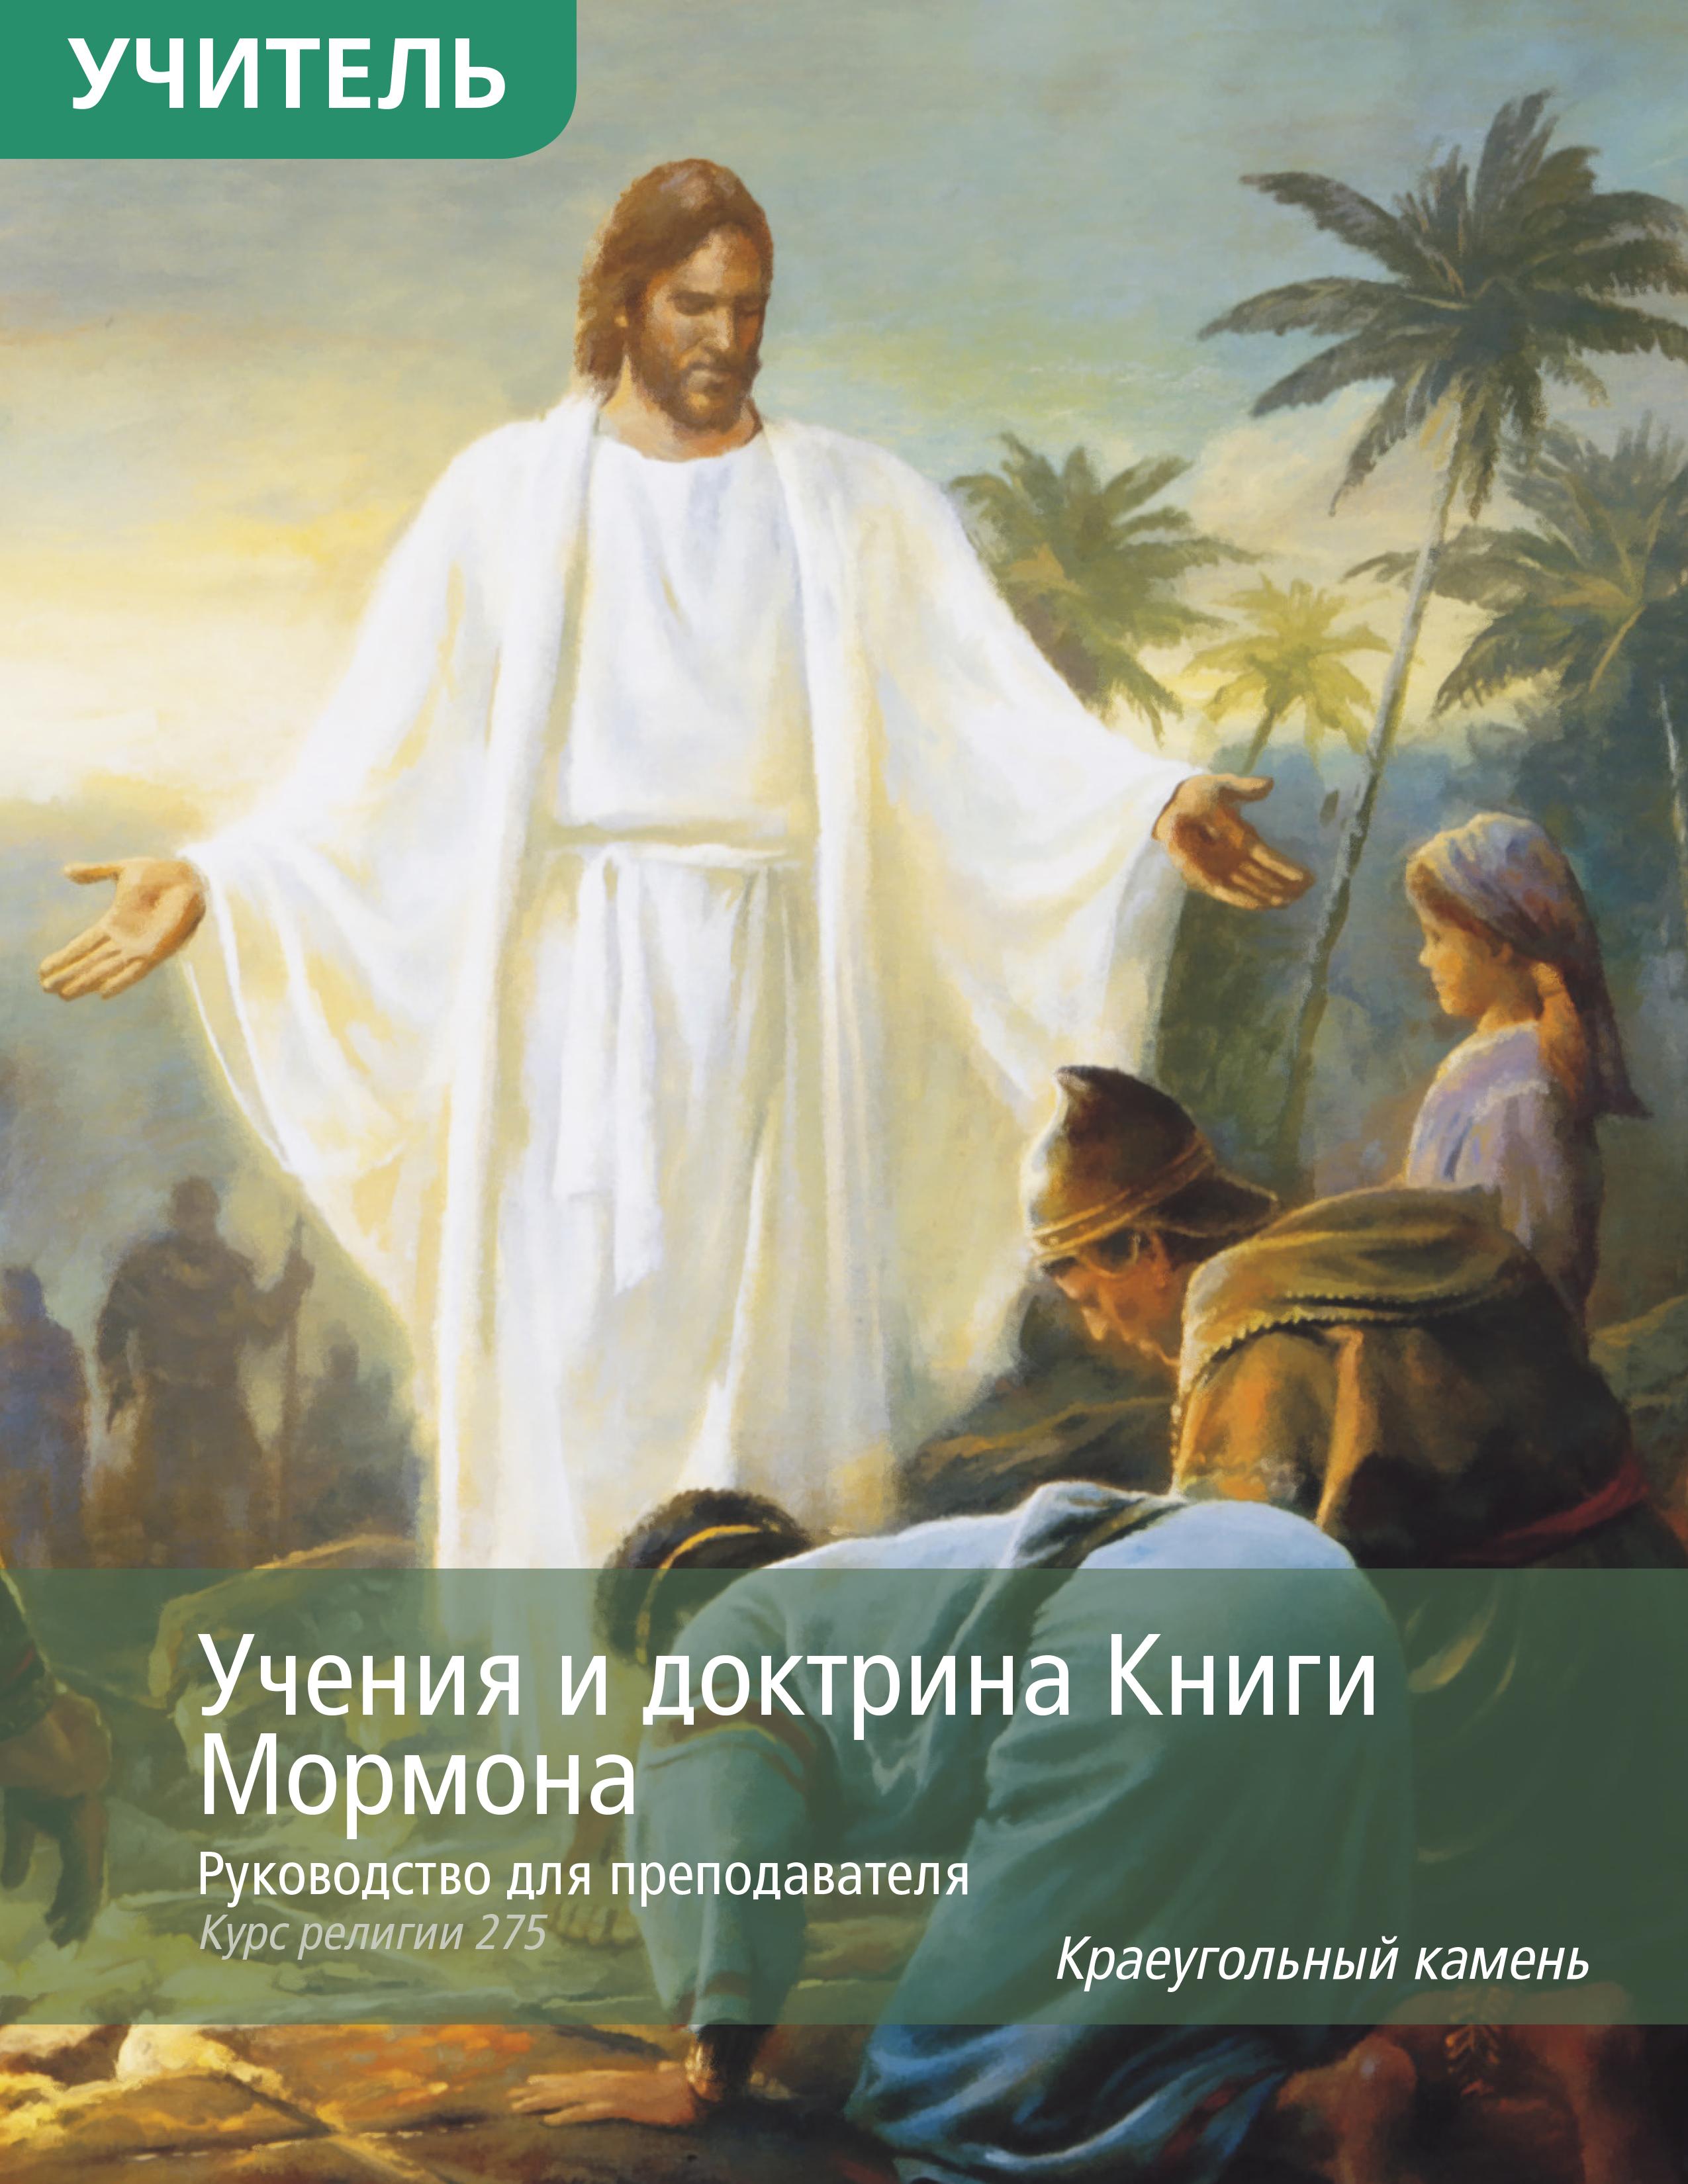 Учения и доктрина Книги Мормона. Руководство для преподавателя